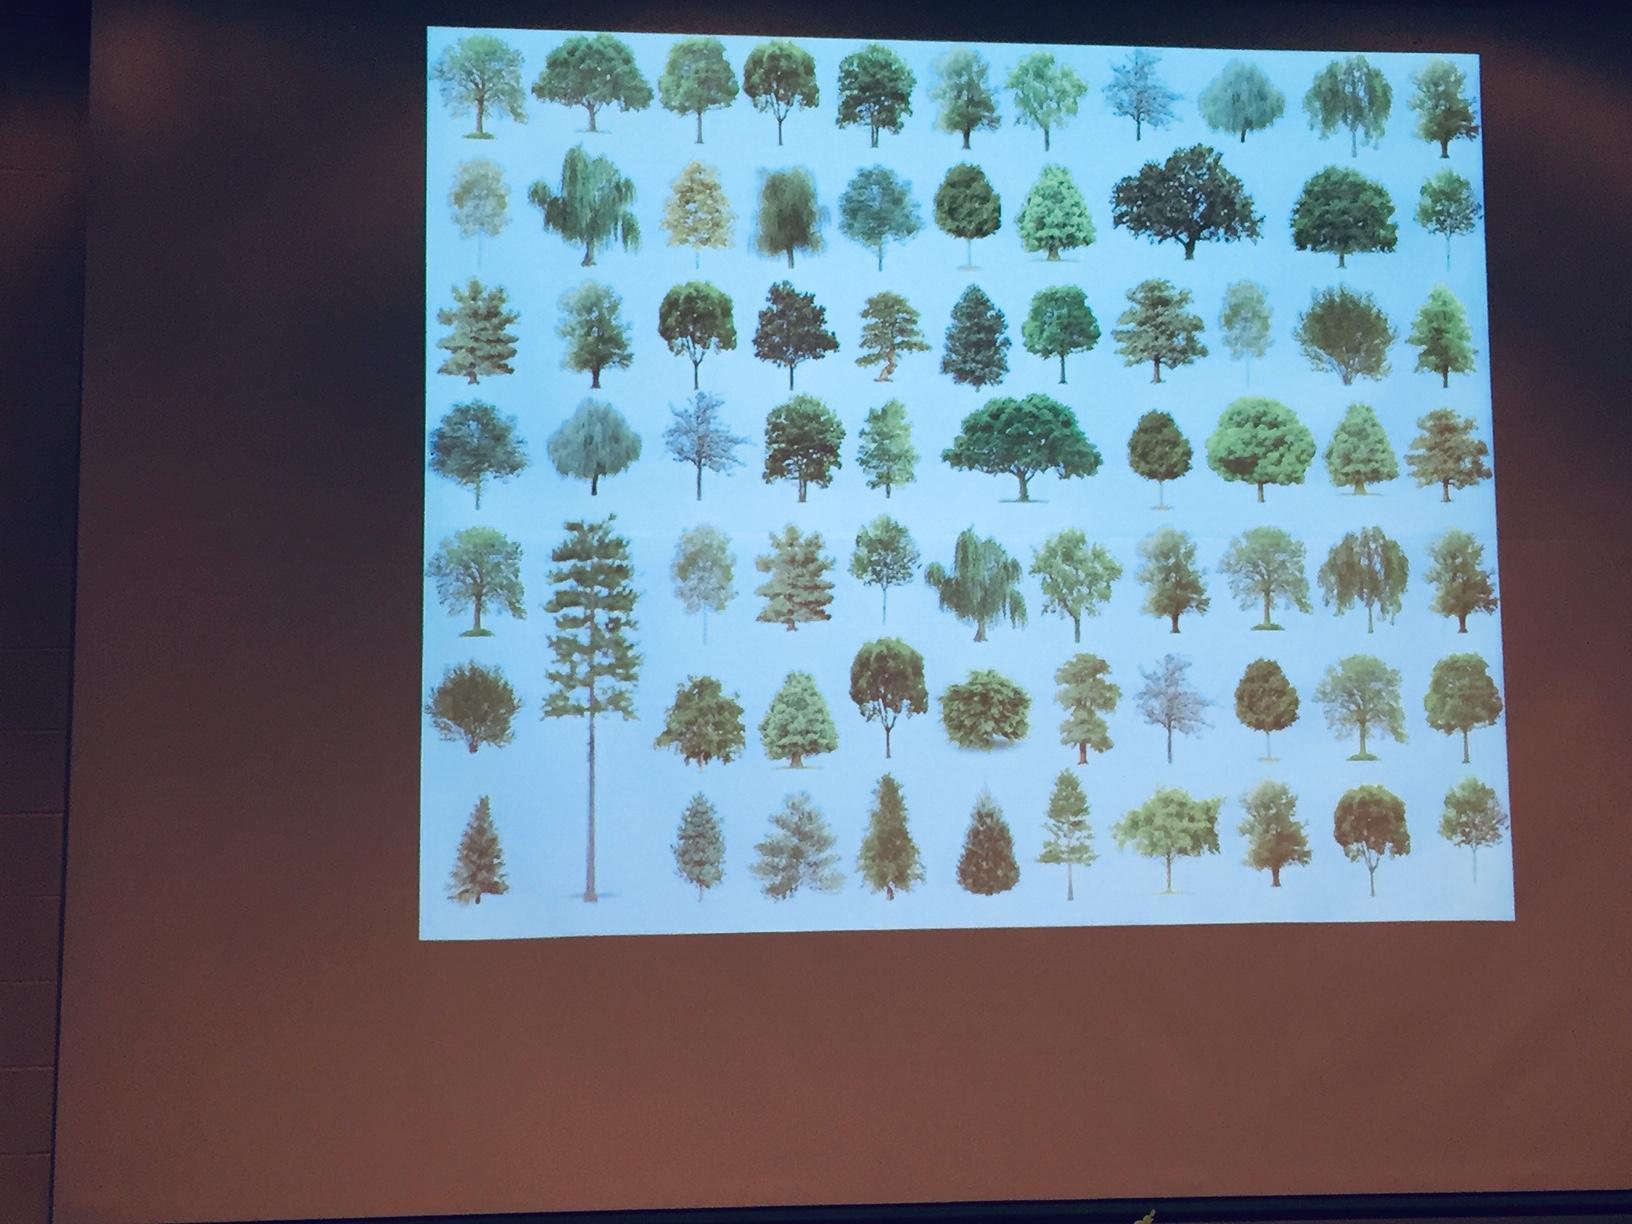 All trees.jpg